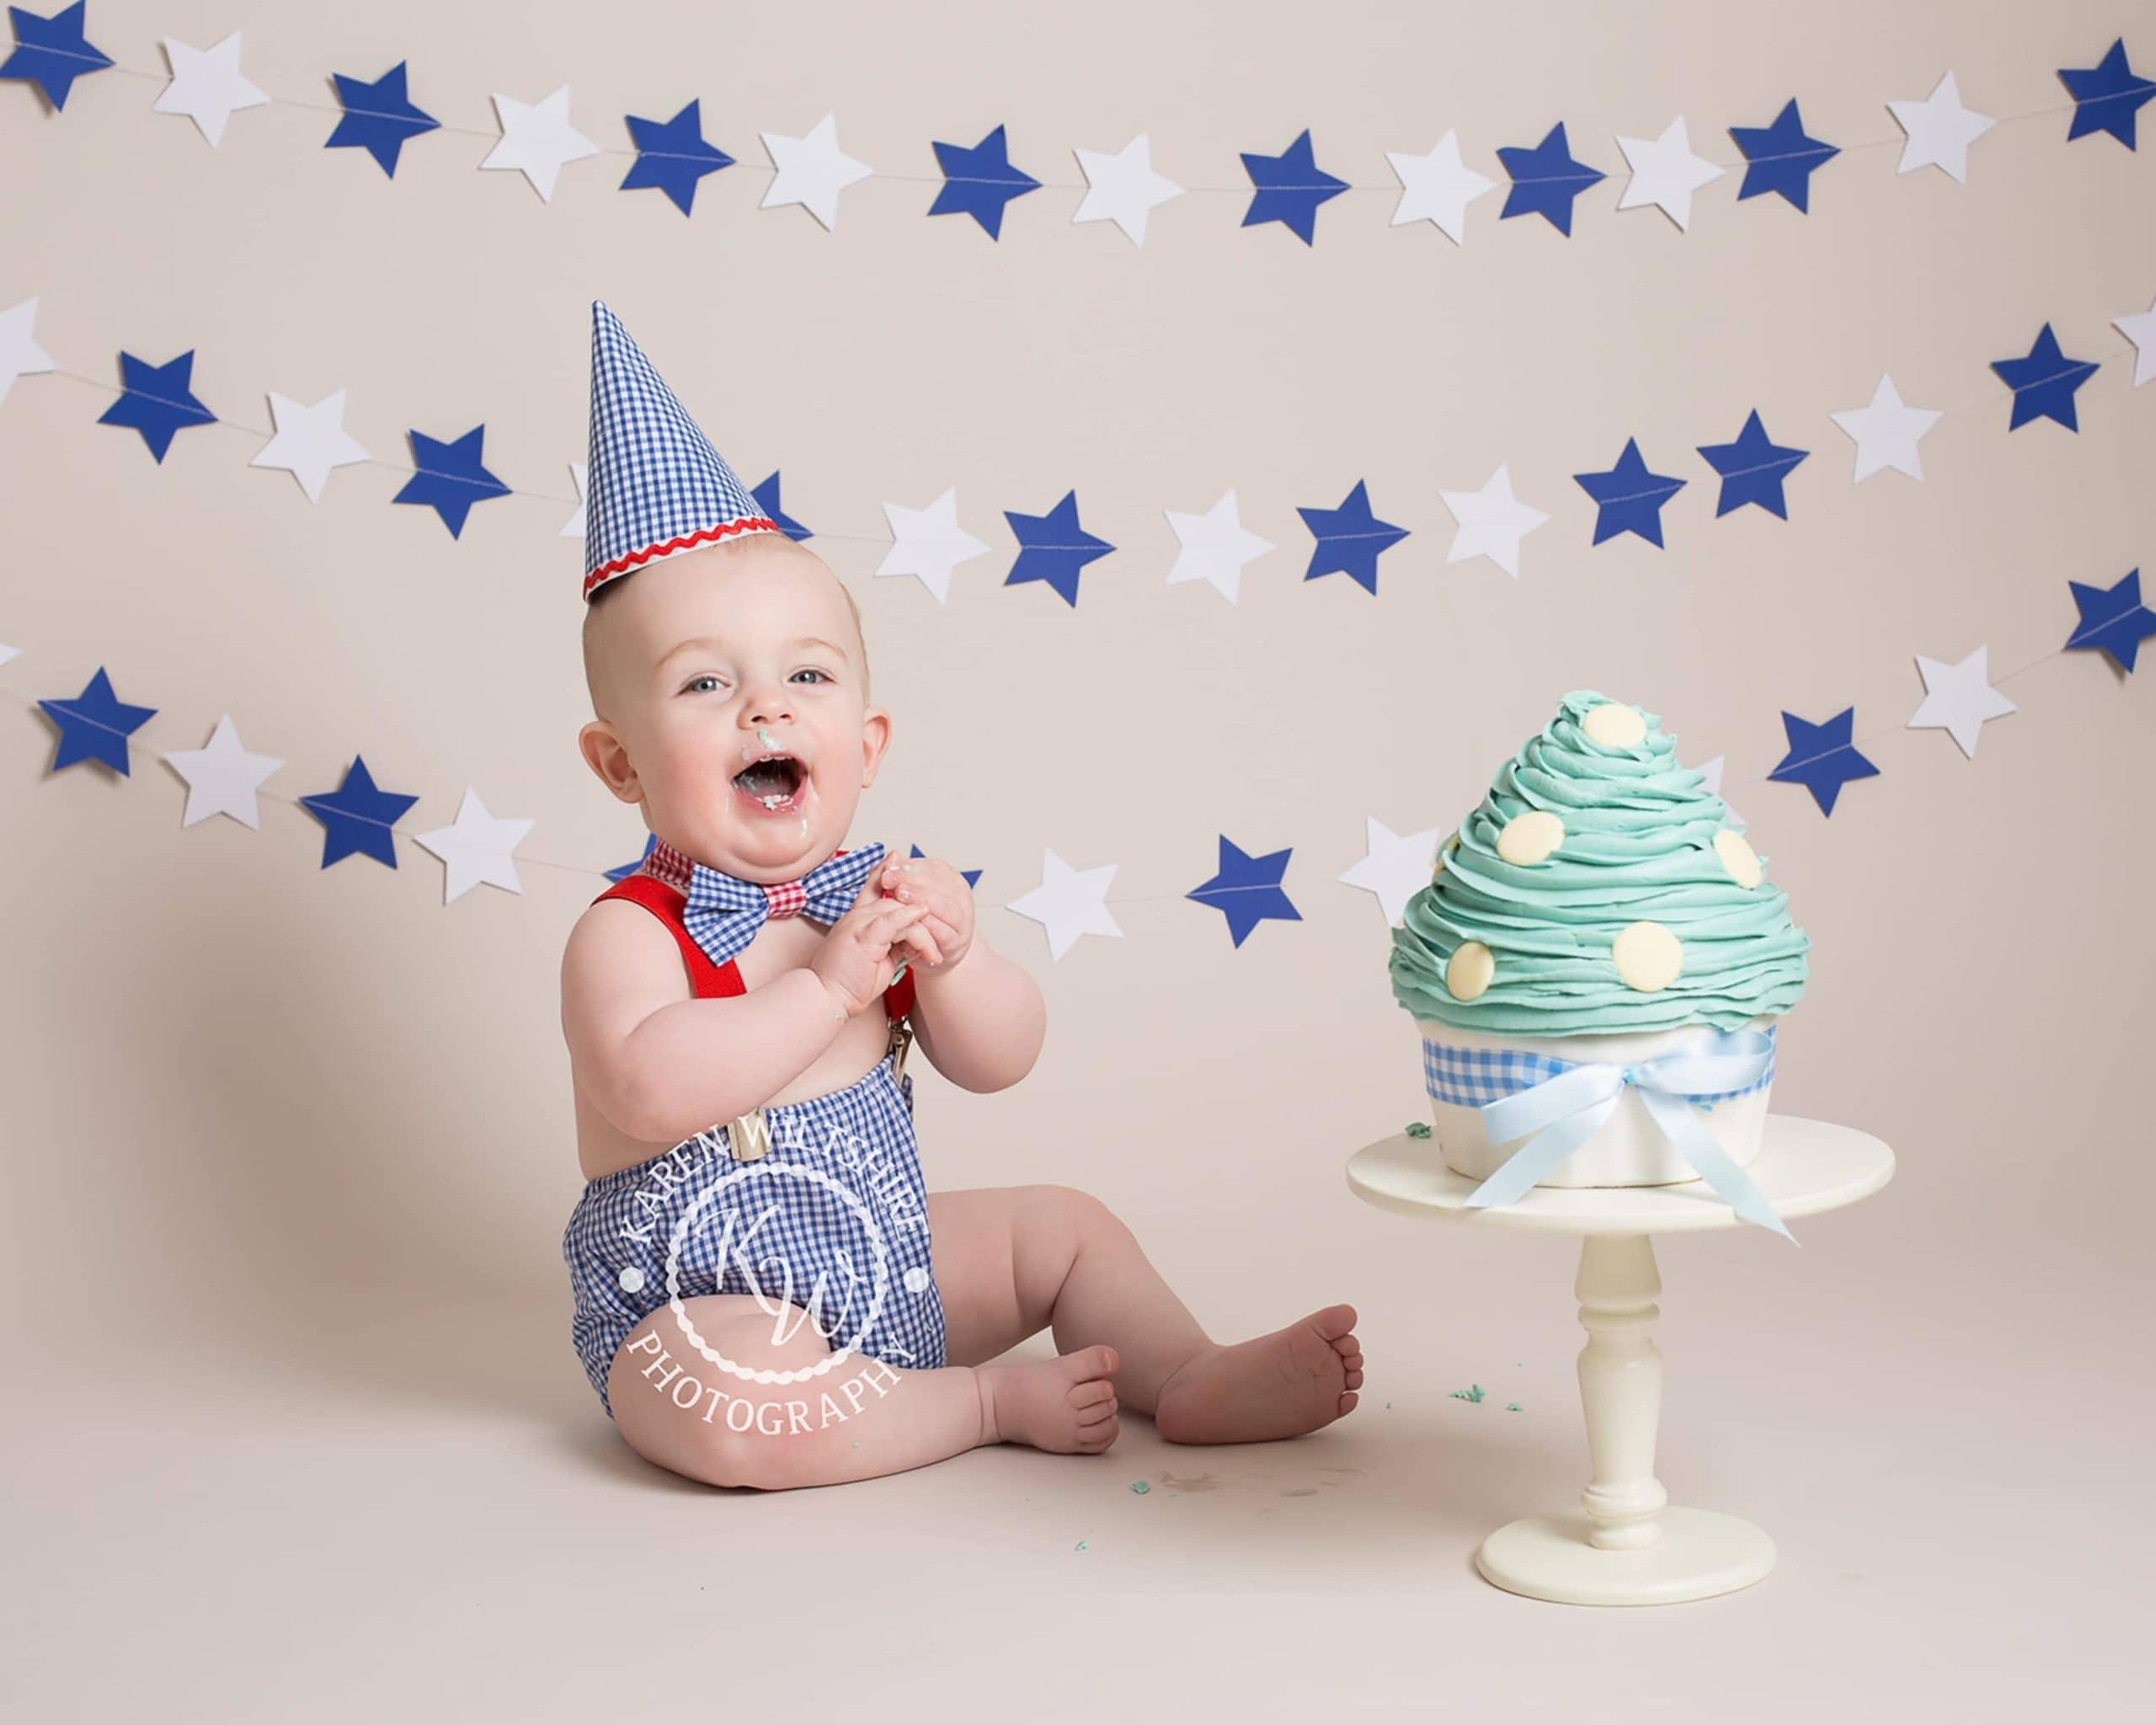 First birthday cake smash with blue stars